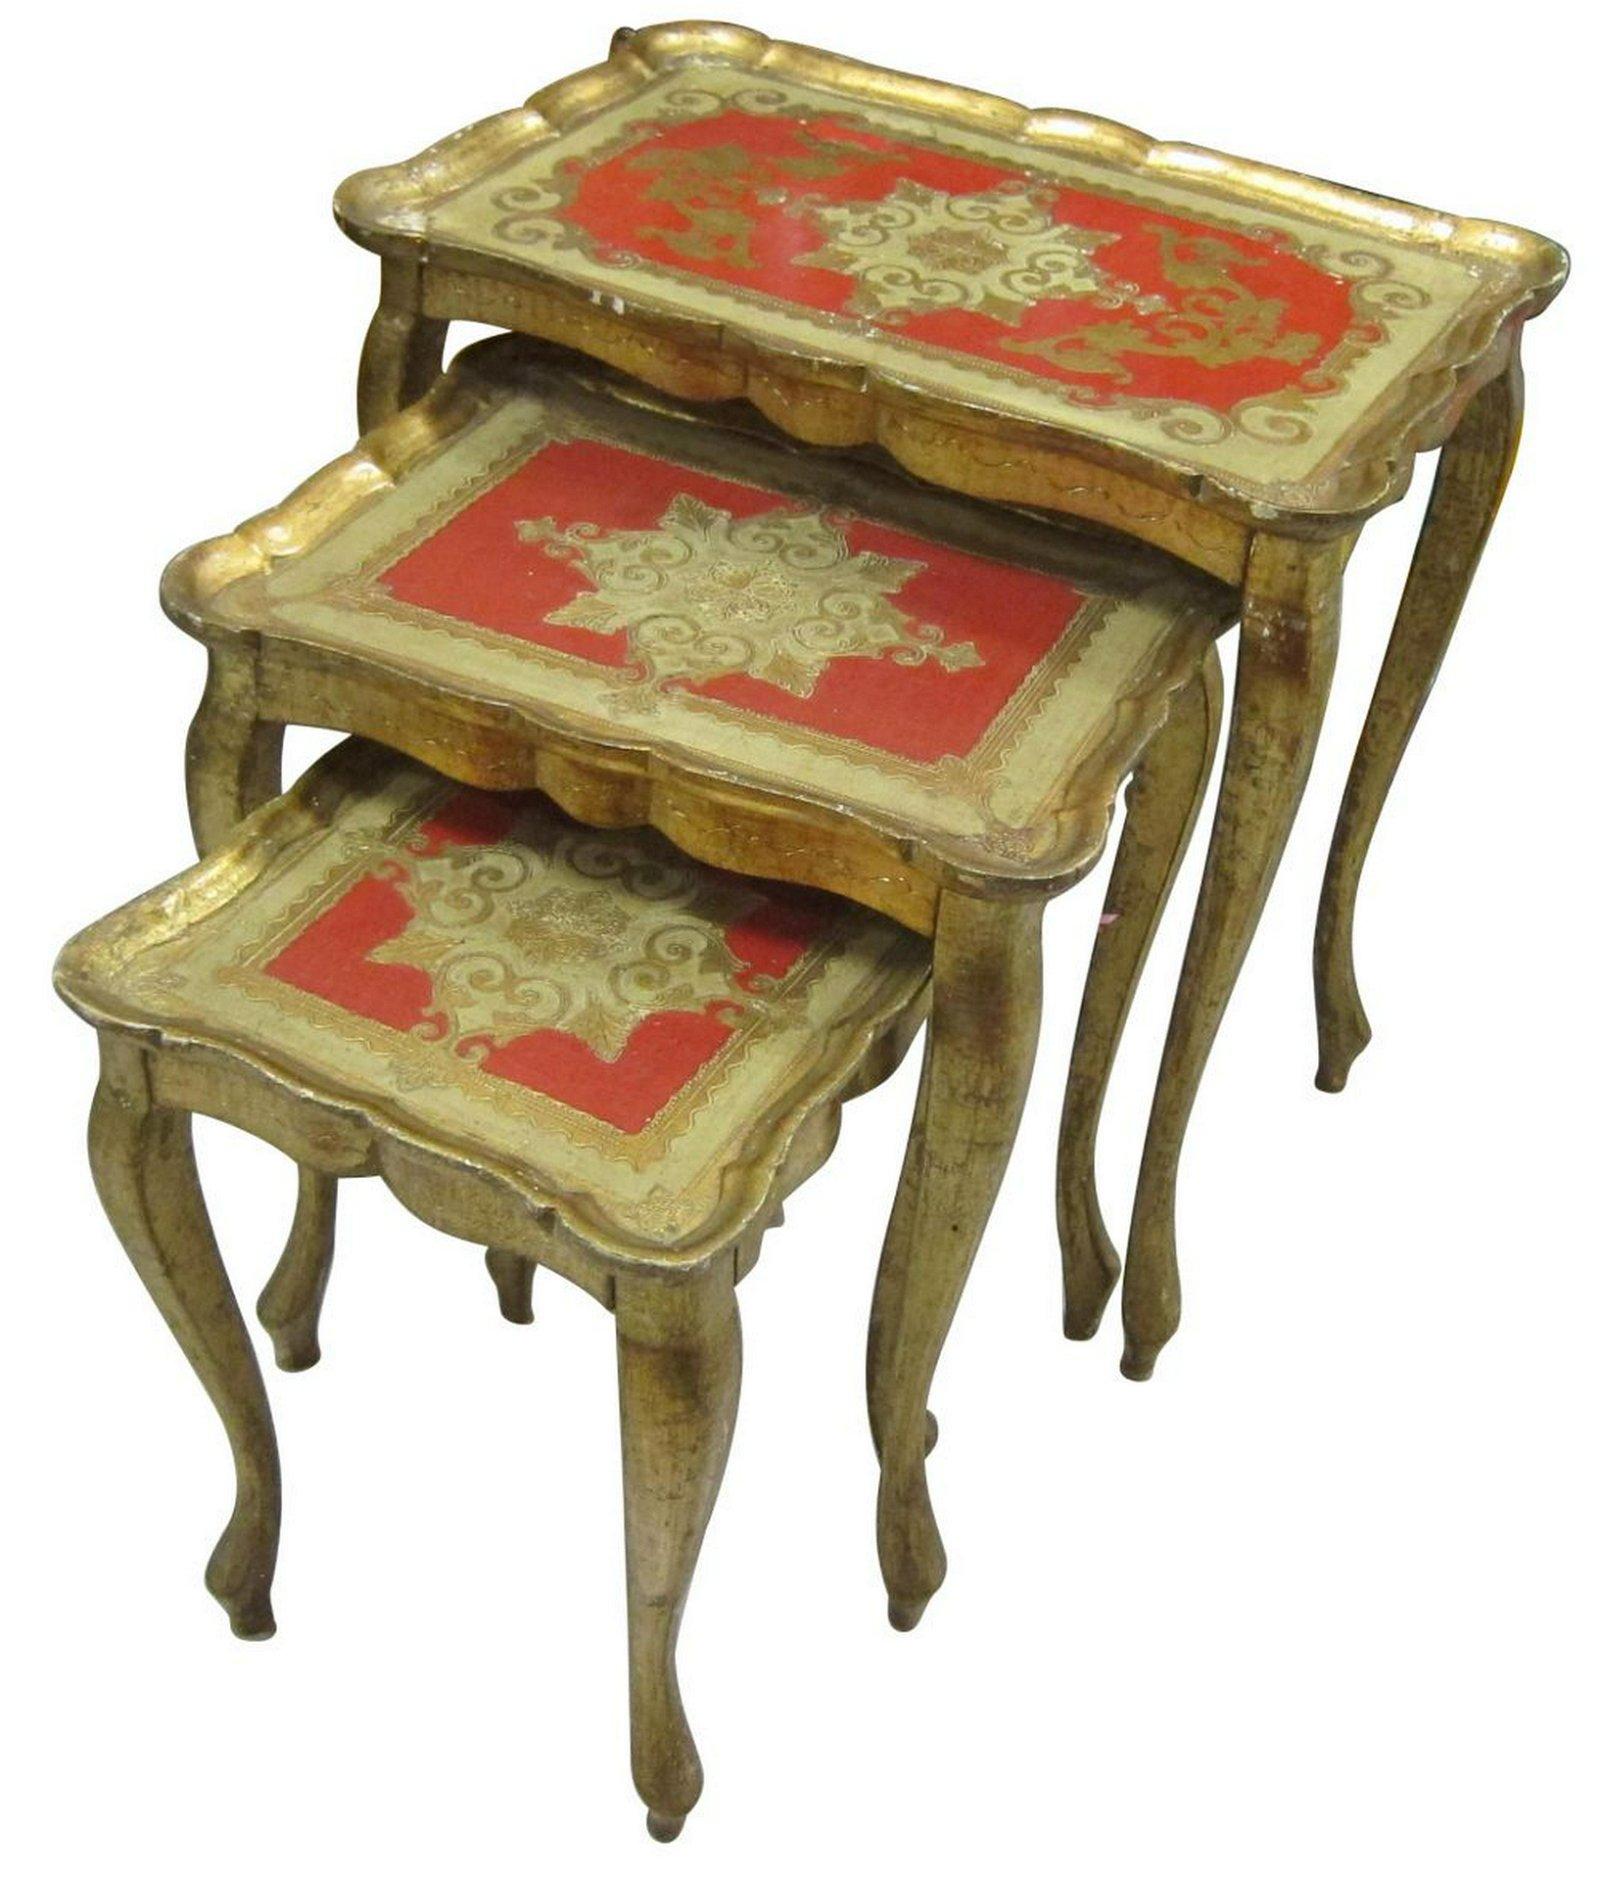 Set of 3 Florentine-style nesting table